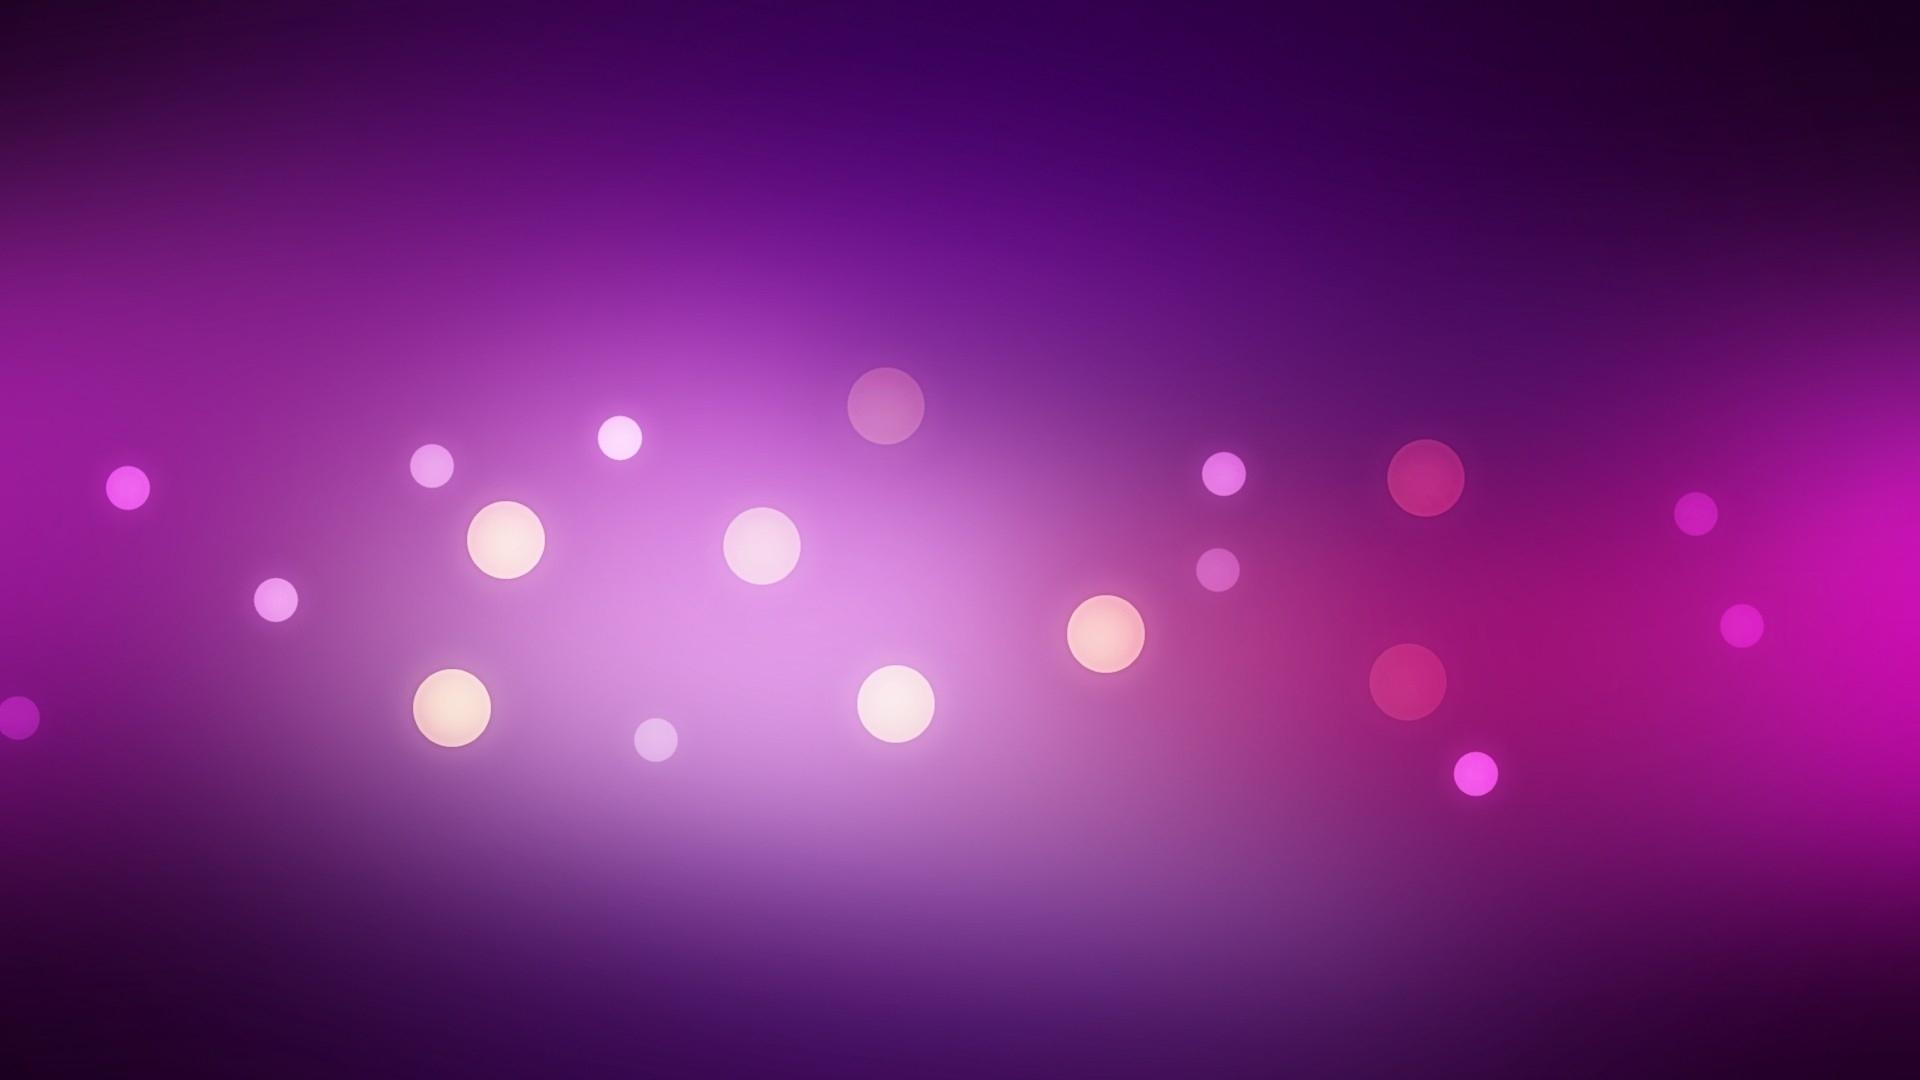 Purple Abstract wallpapers for desktop